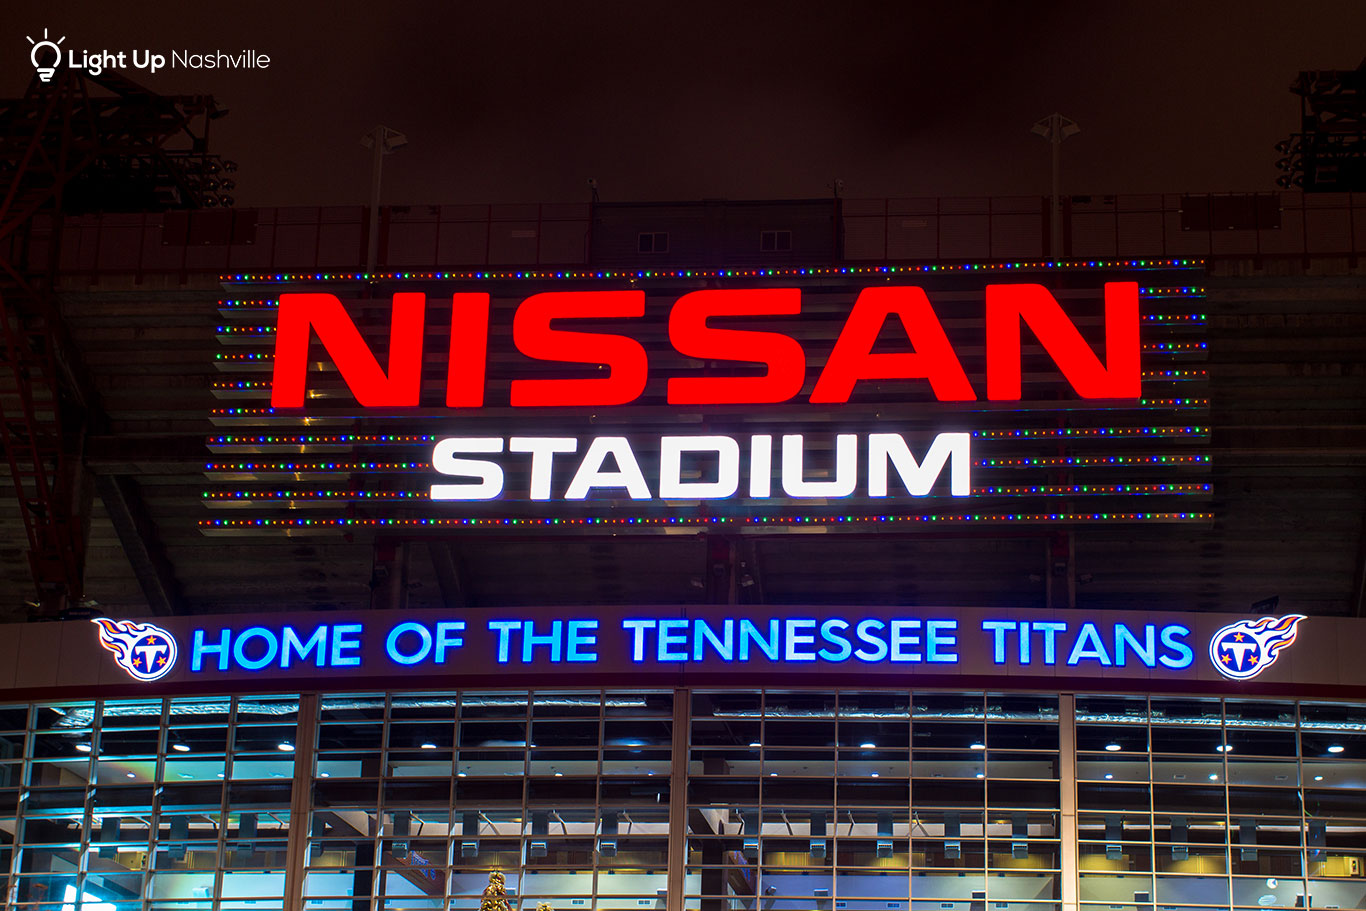 Holiday lights on Titans stadium sign